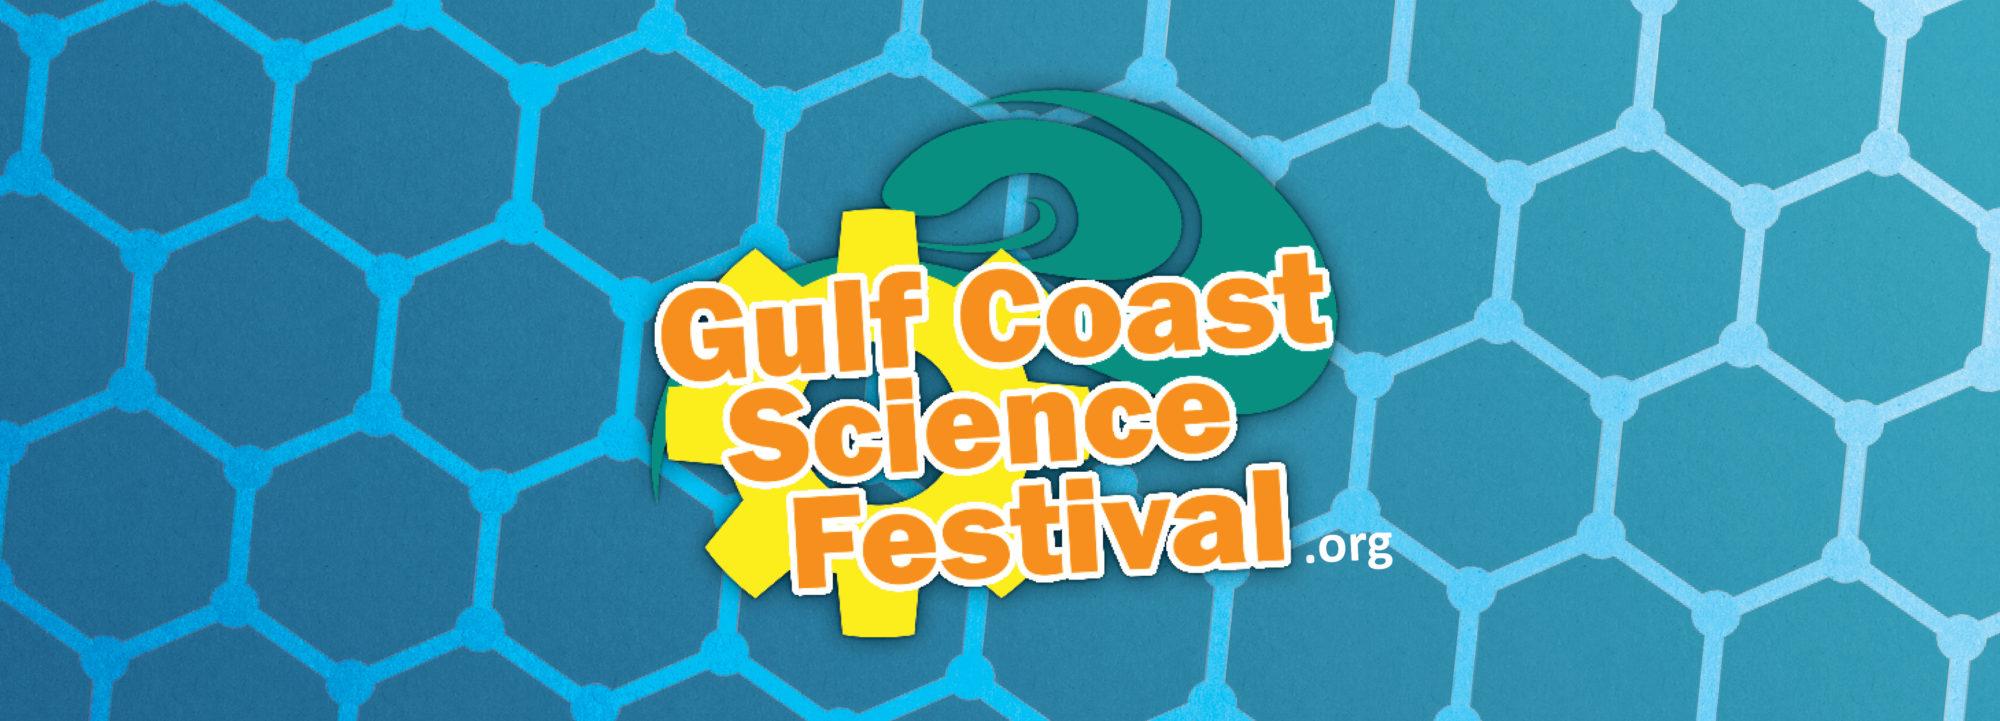 Gulf Coast Science Festival